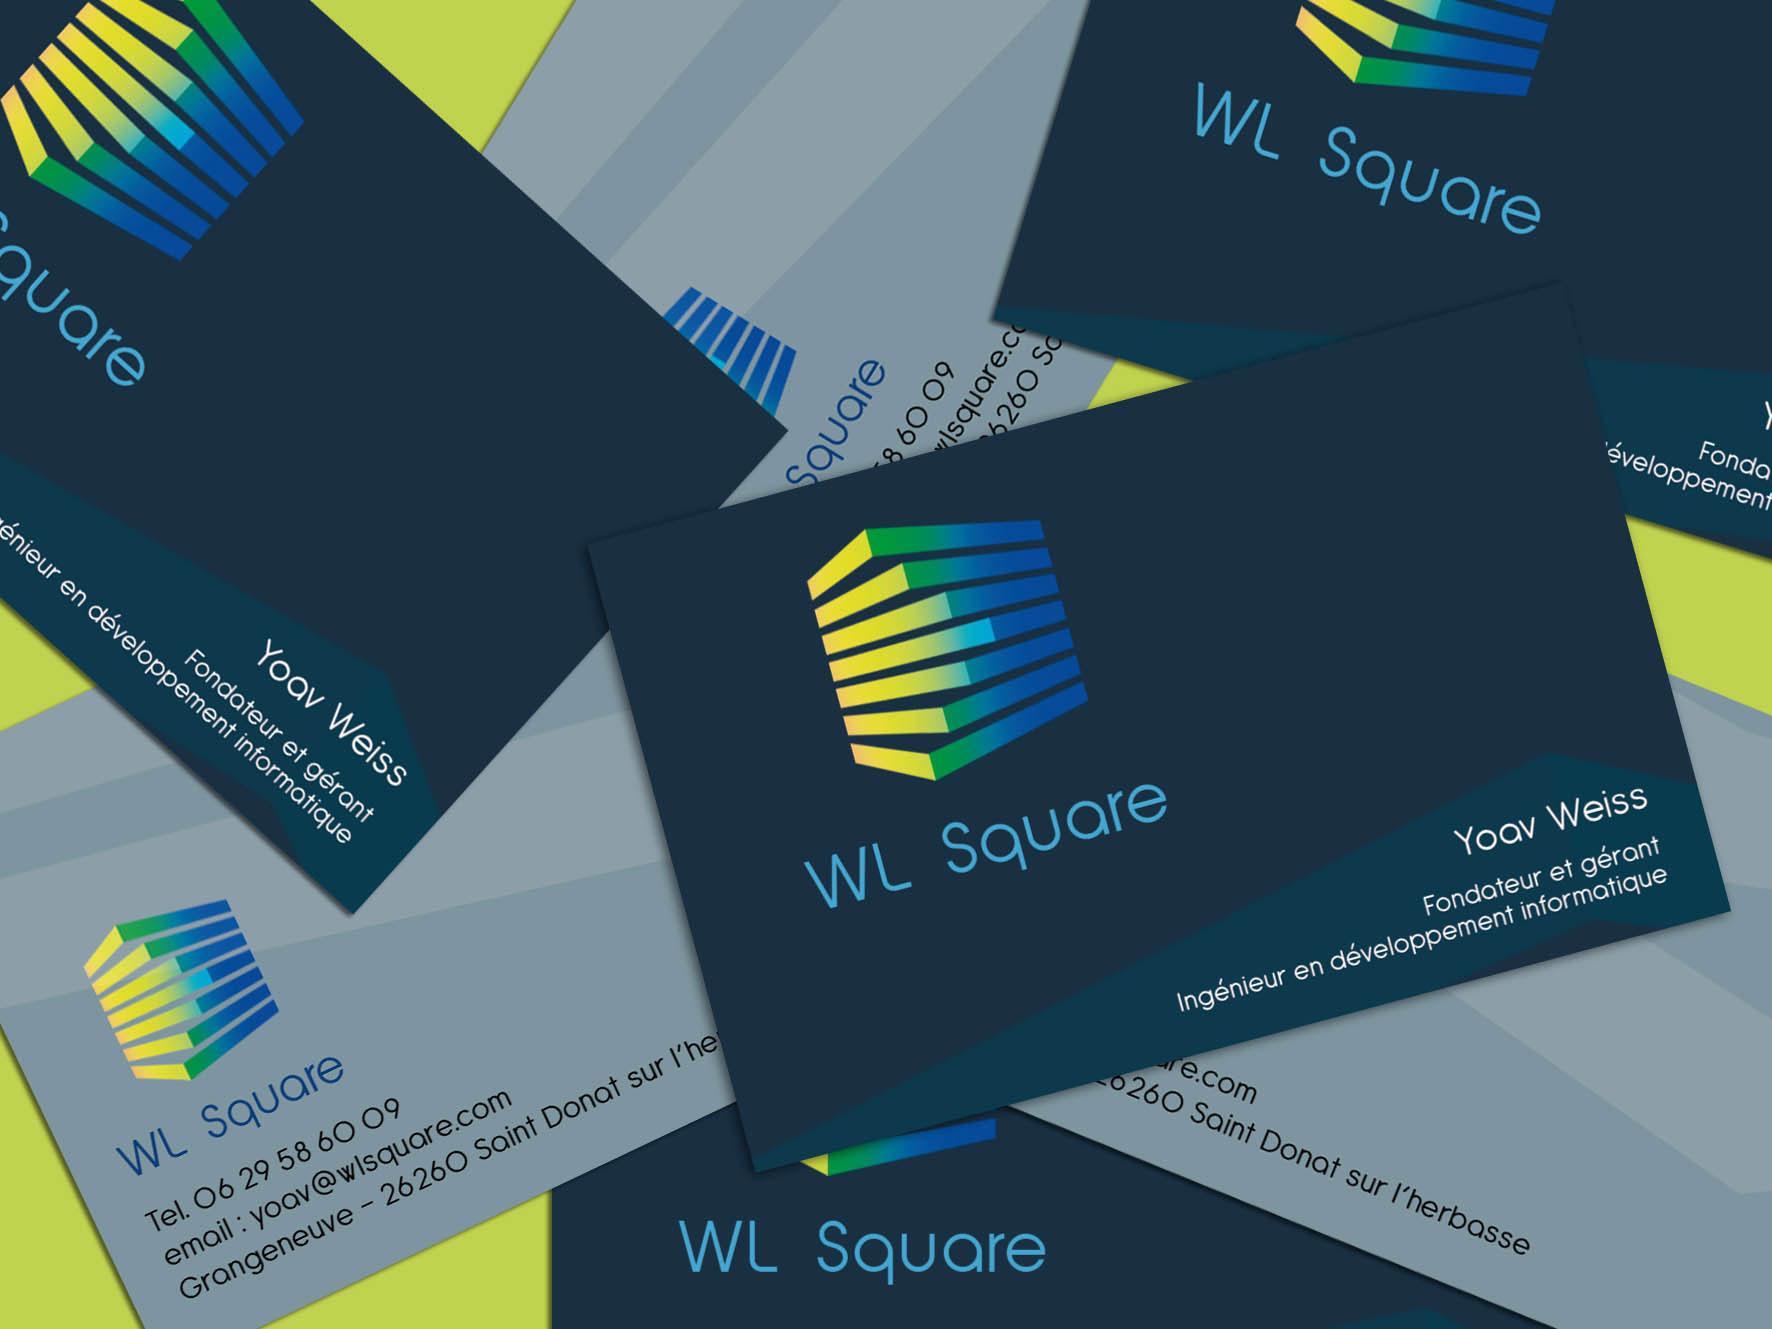 WL Square